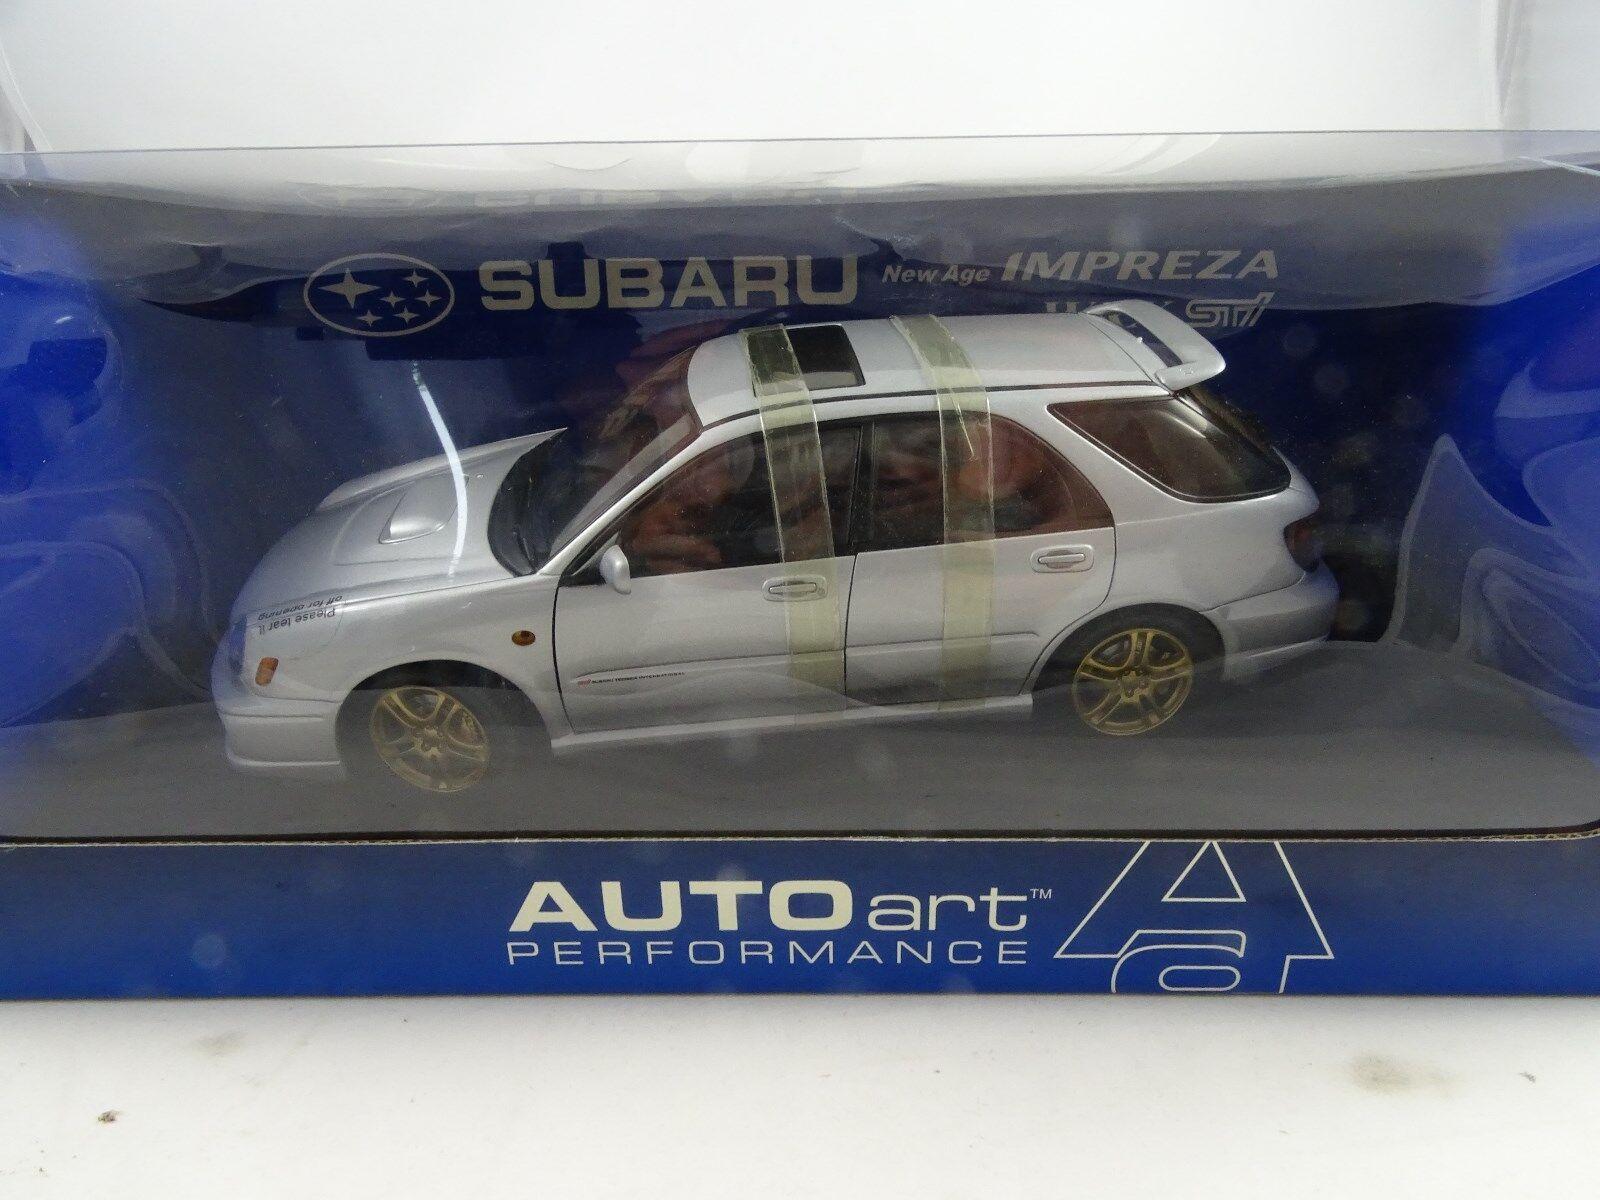 1 18 Autoart Subaru New Age Impreza Wrx Vehículo Sti 2001 Plata - Rareza